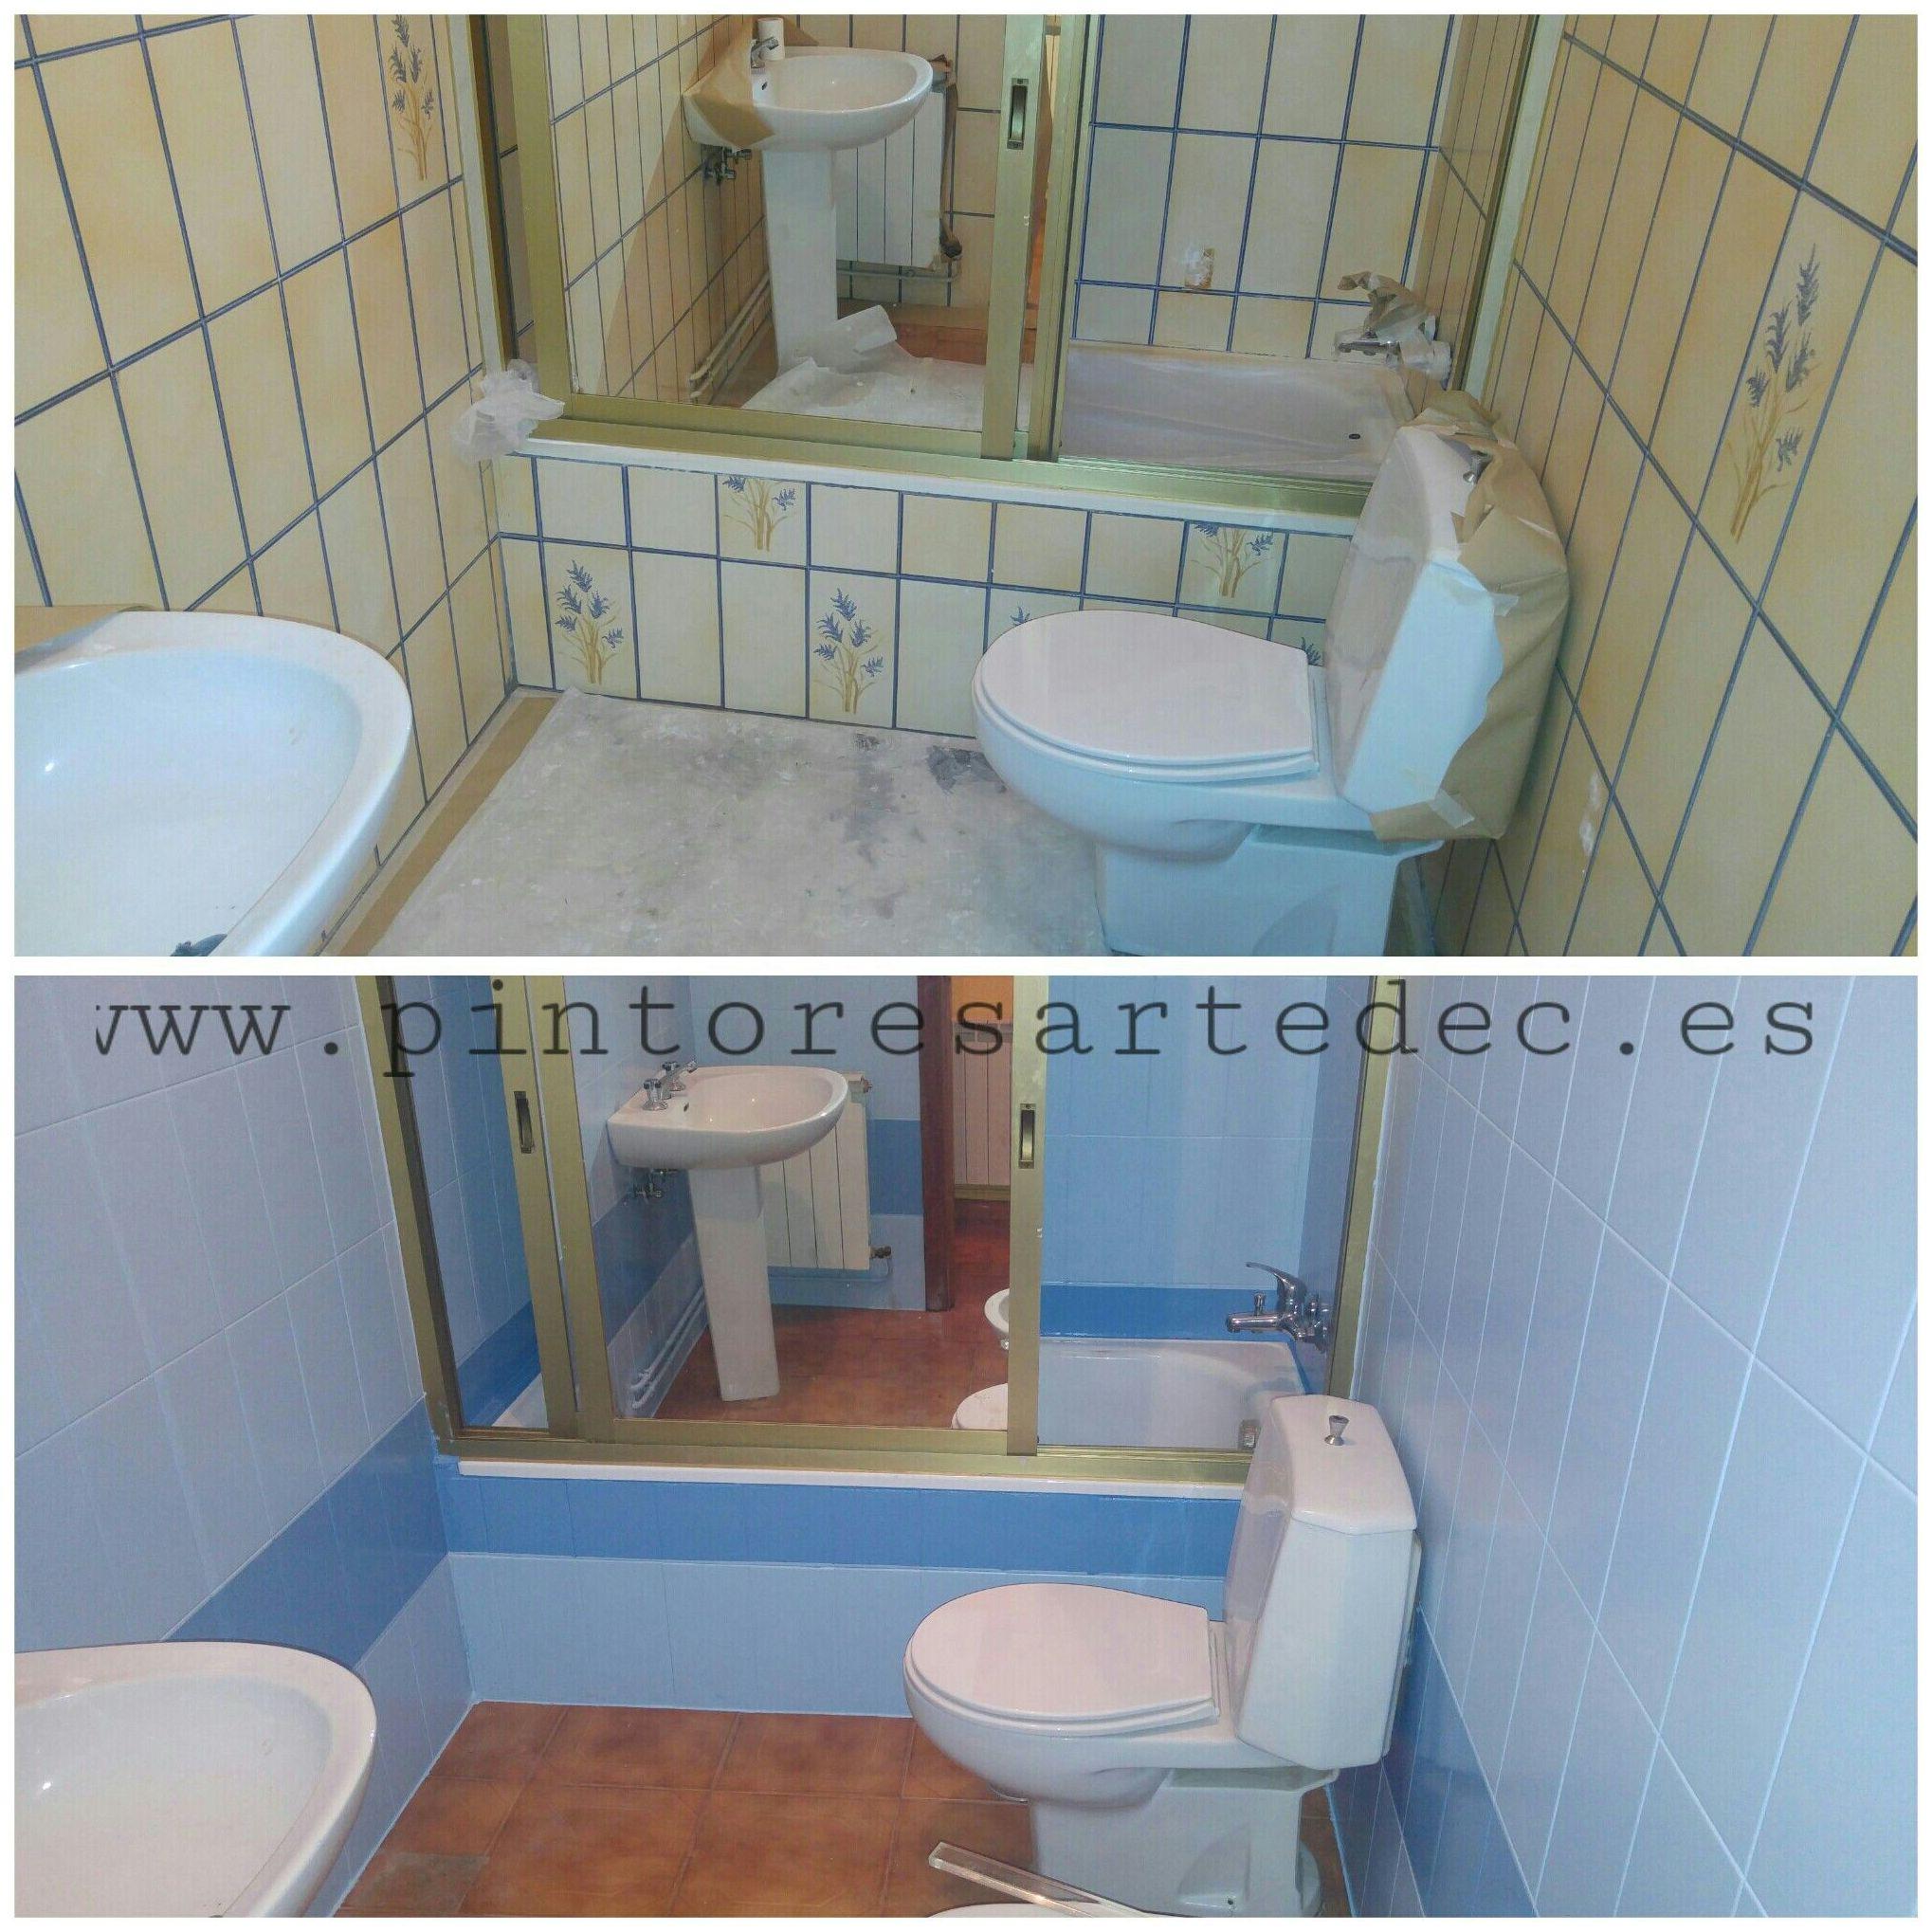 Pintura para azulejos servicios de pintores artedec - Pintura para azulejos de bano ...